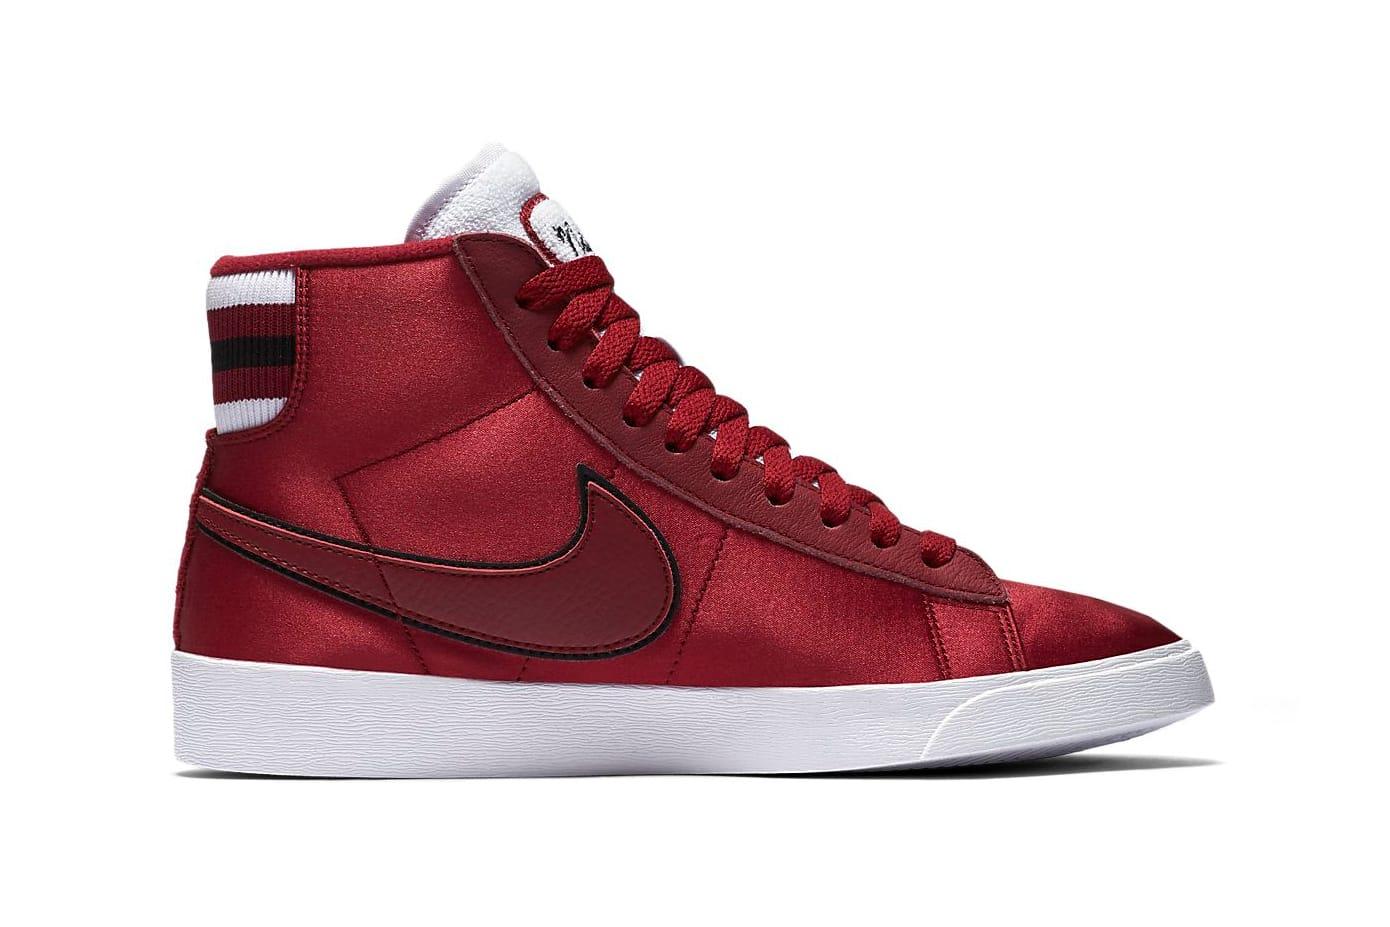 Nike Blazer Mid Premium in \